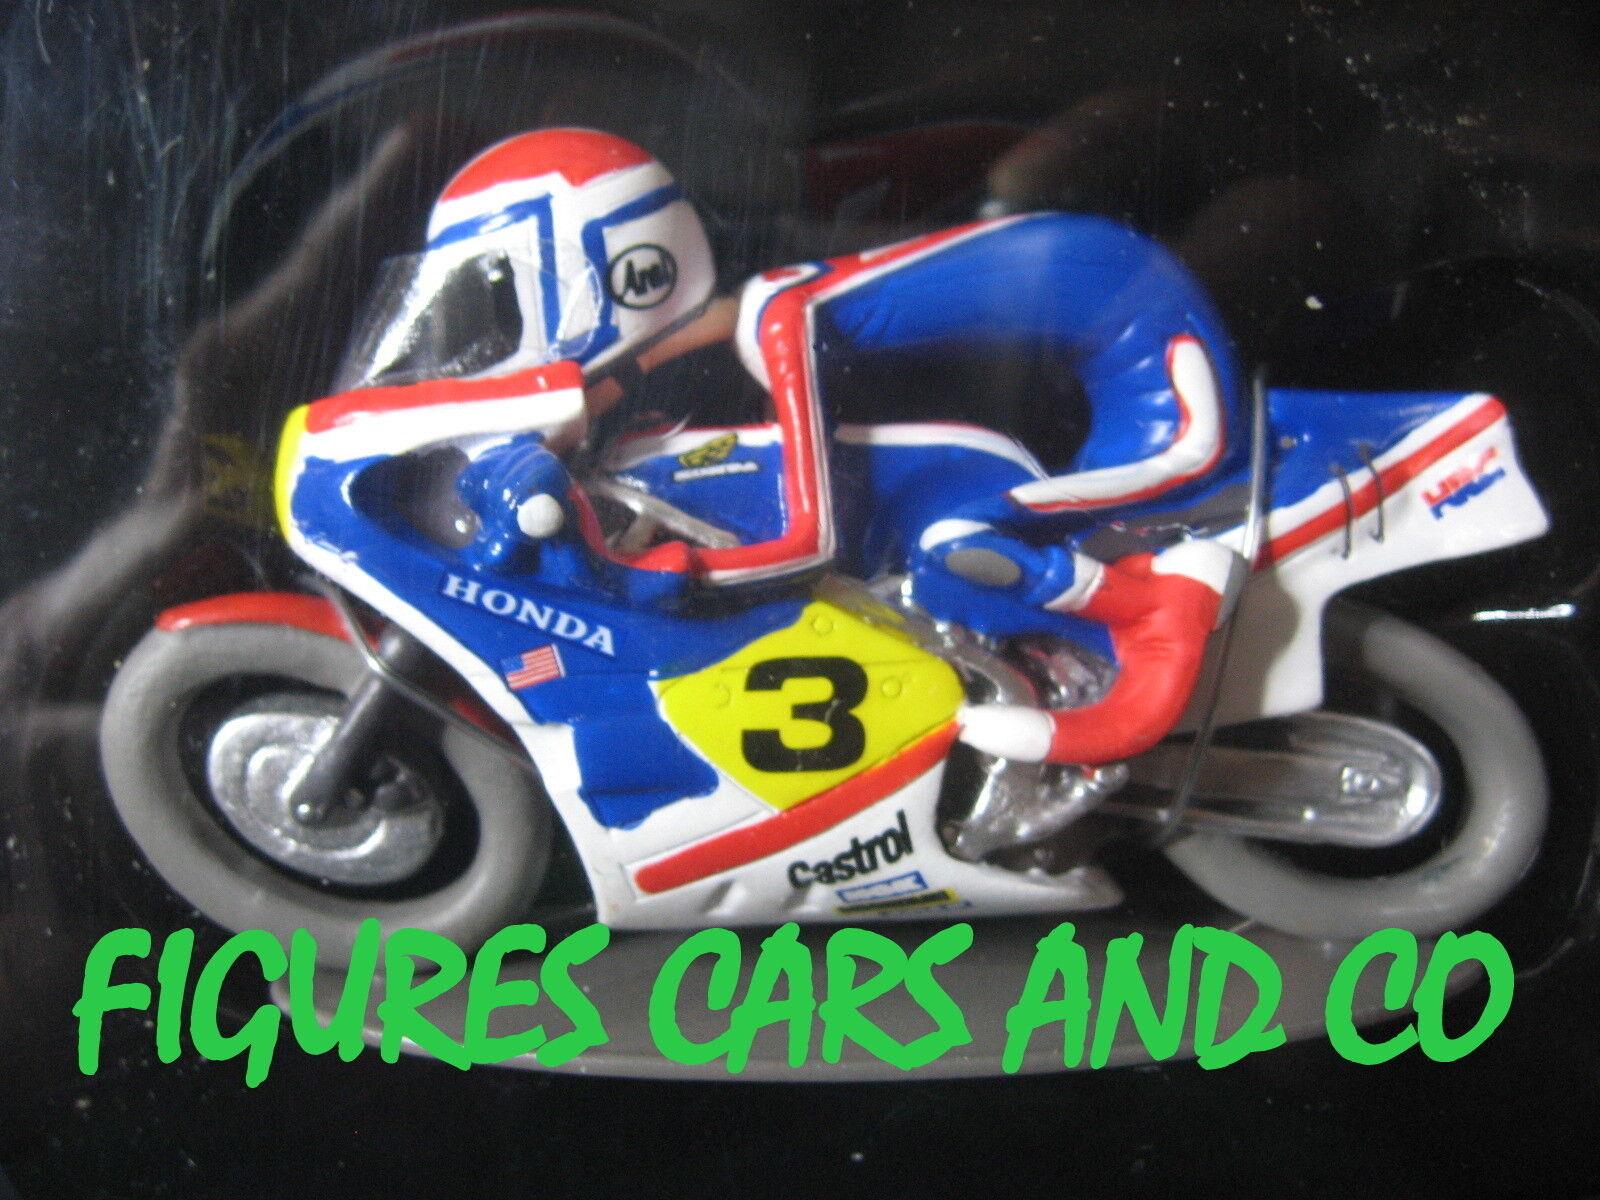 SERIE 2 2 2 MOTORRAD JOE BAR TEAM 99 HONDA 500 NS   FREDDIE SPENCER f43e55